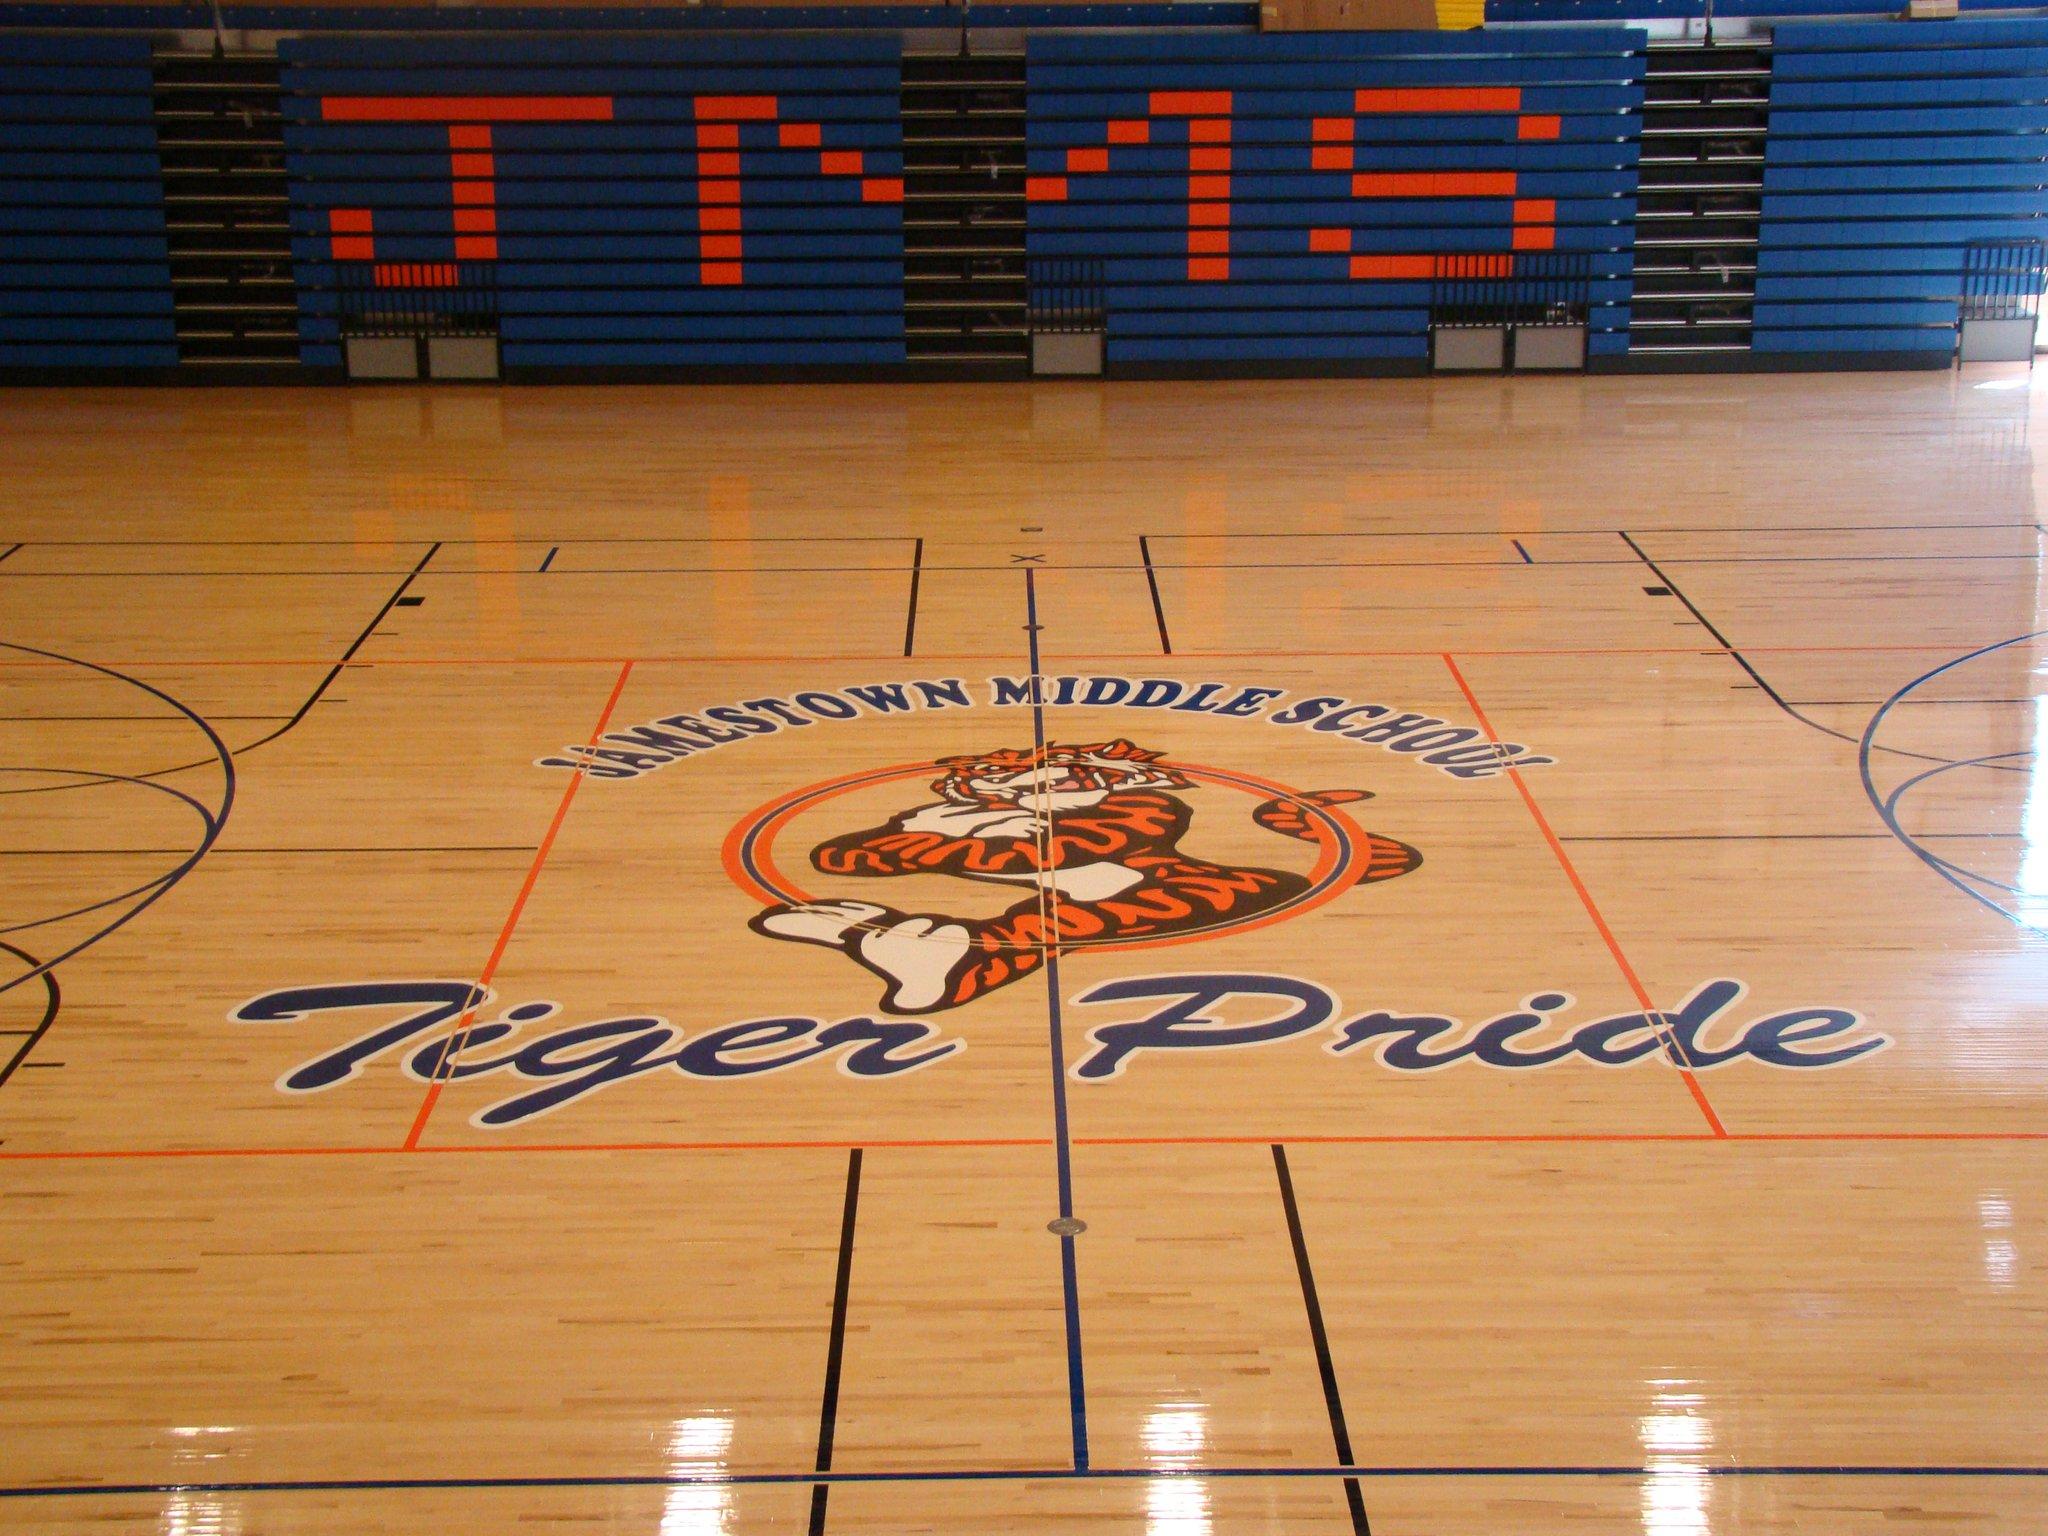 Jamestown Middle School, Greensboro, NC